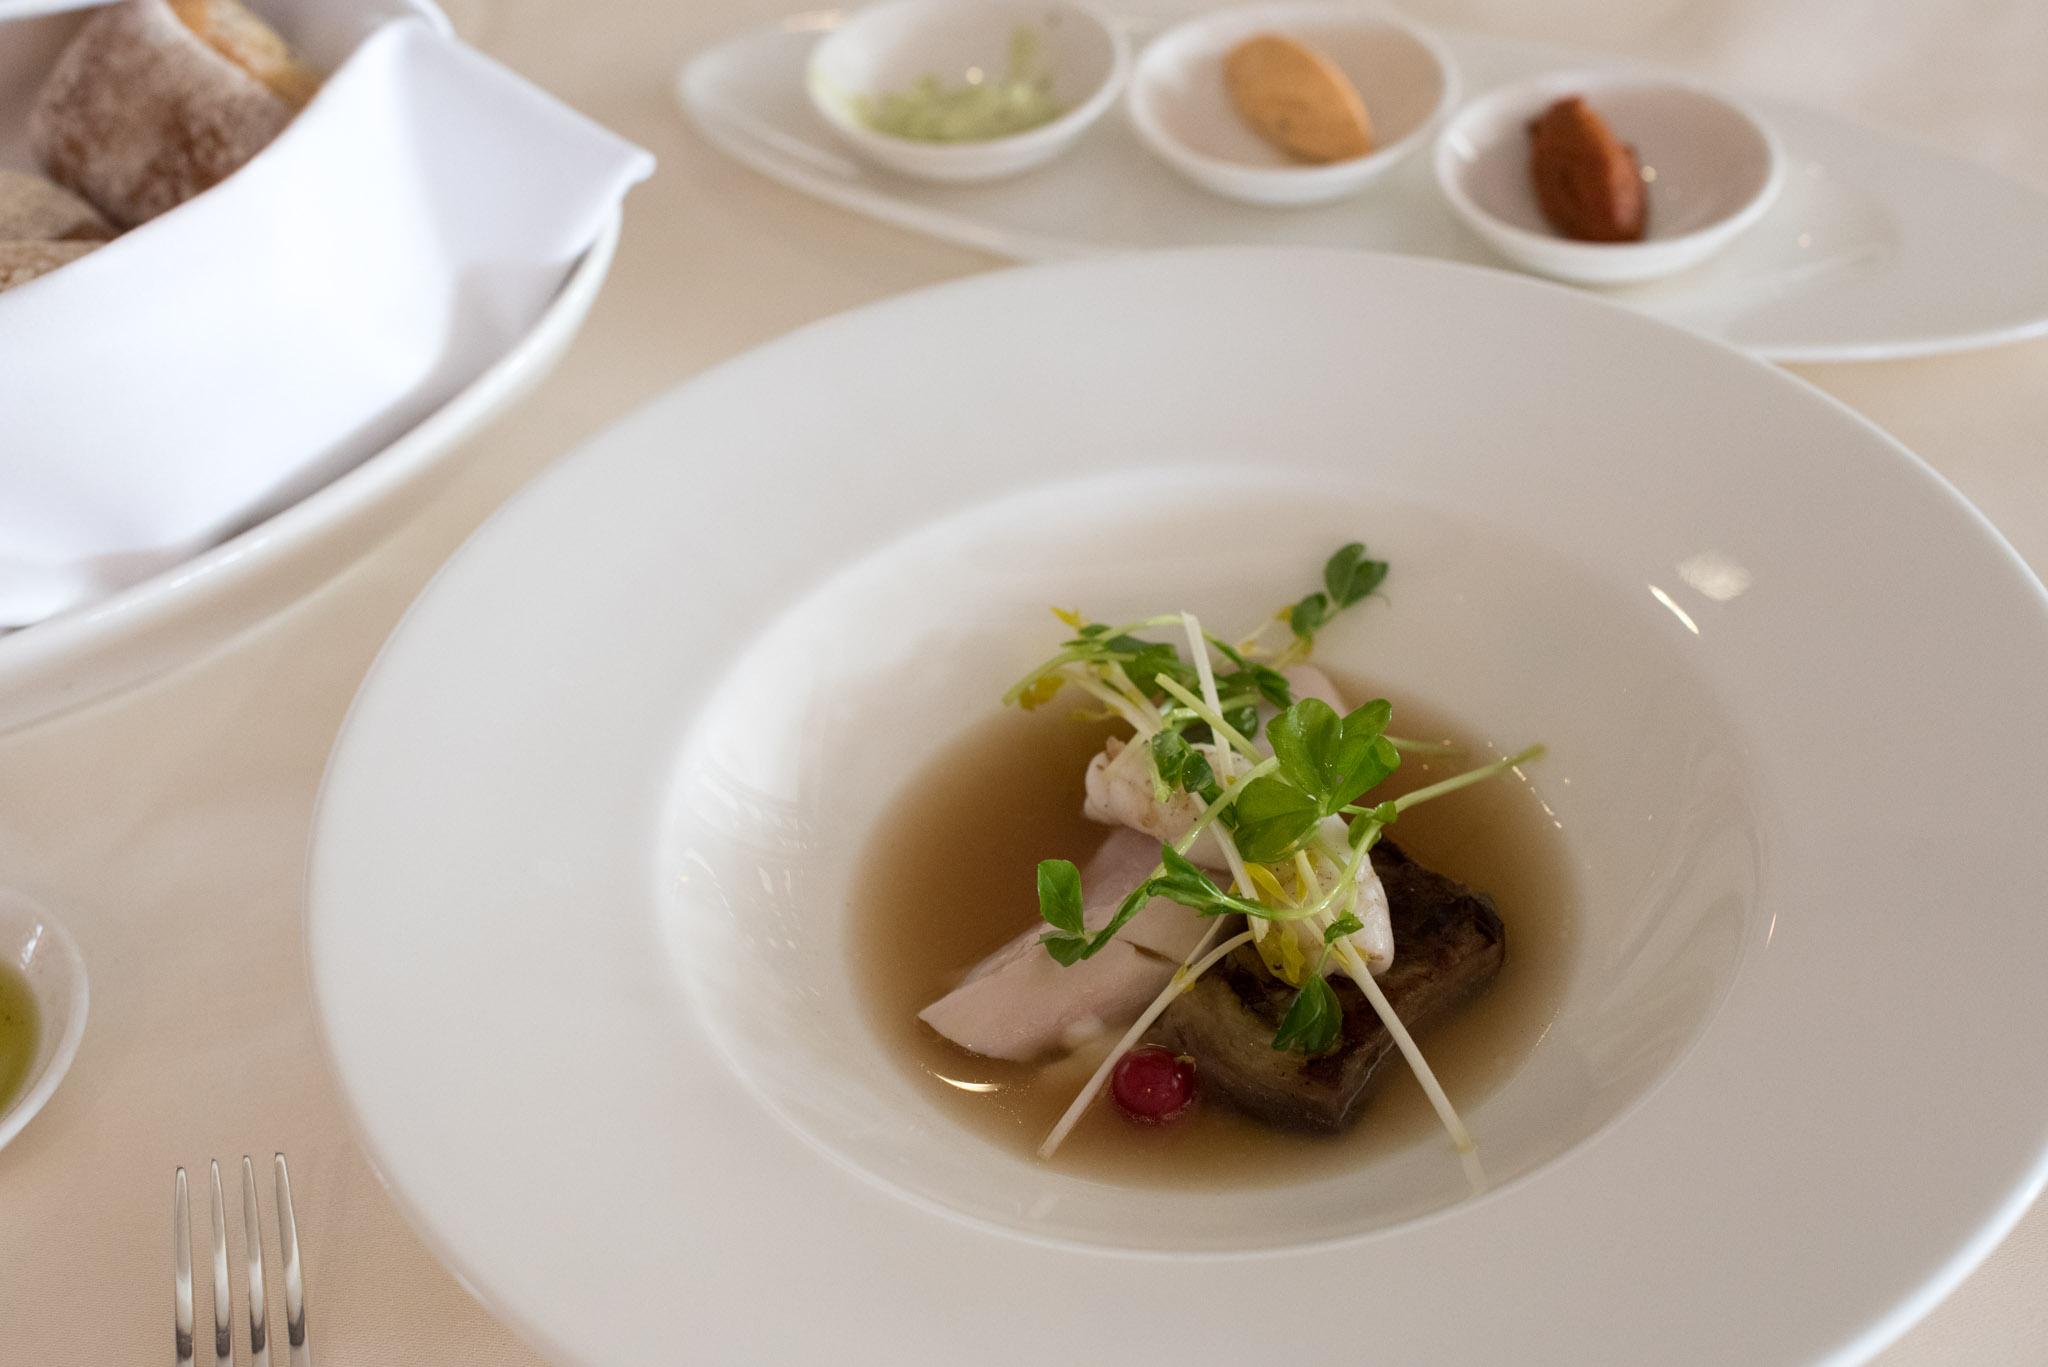 Squid, Rabbit, Eggplant  Dolce Vita - Mandarin Oriental, SIngapore